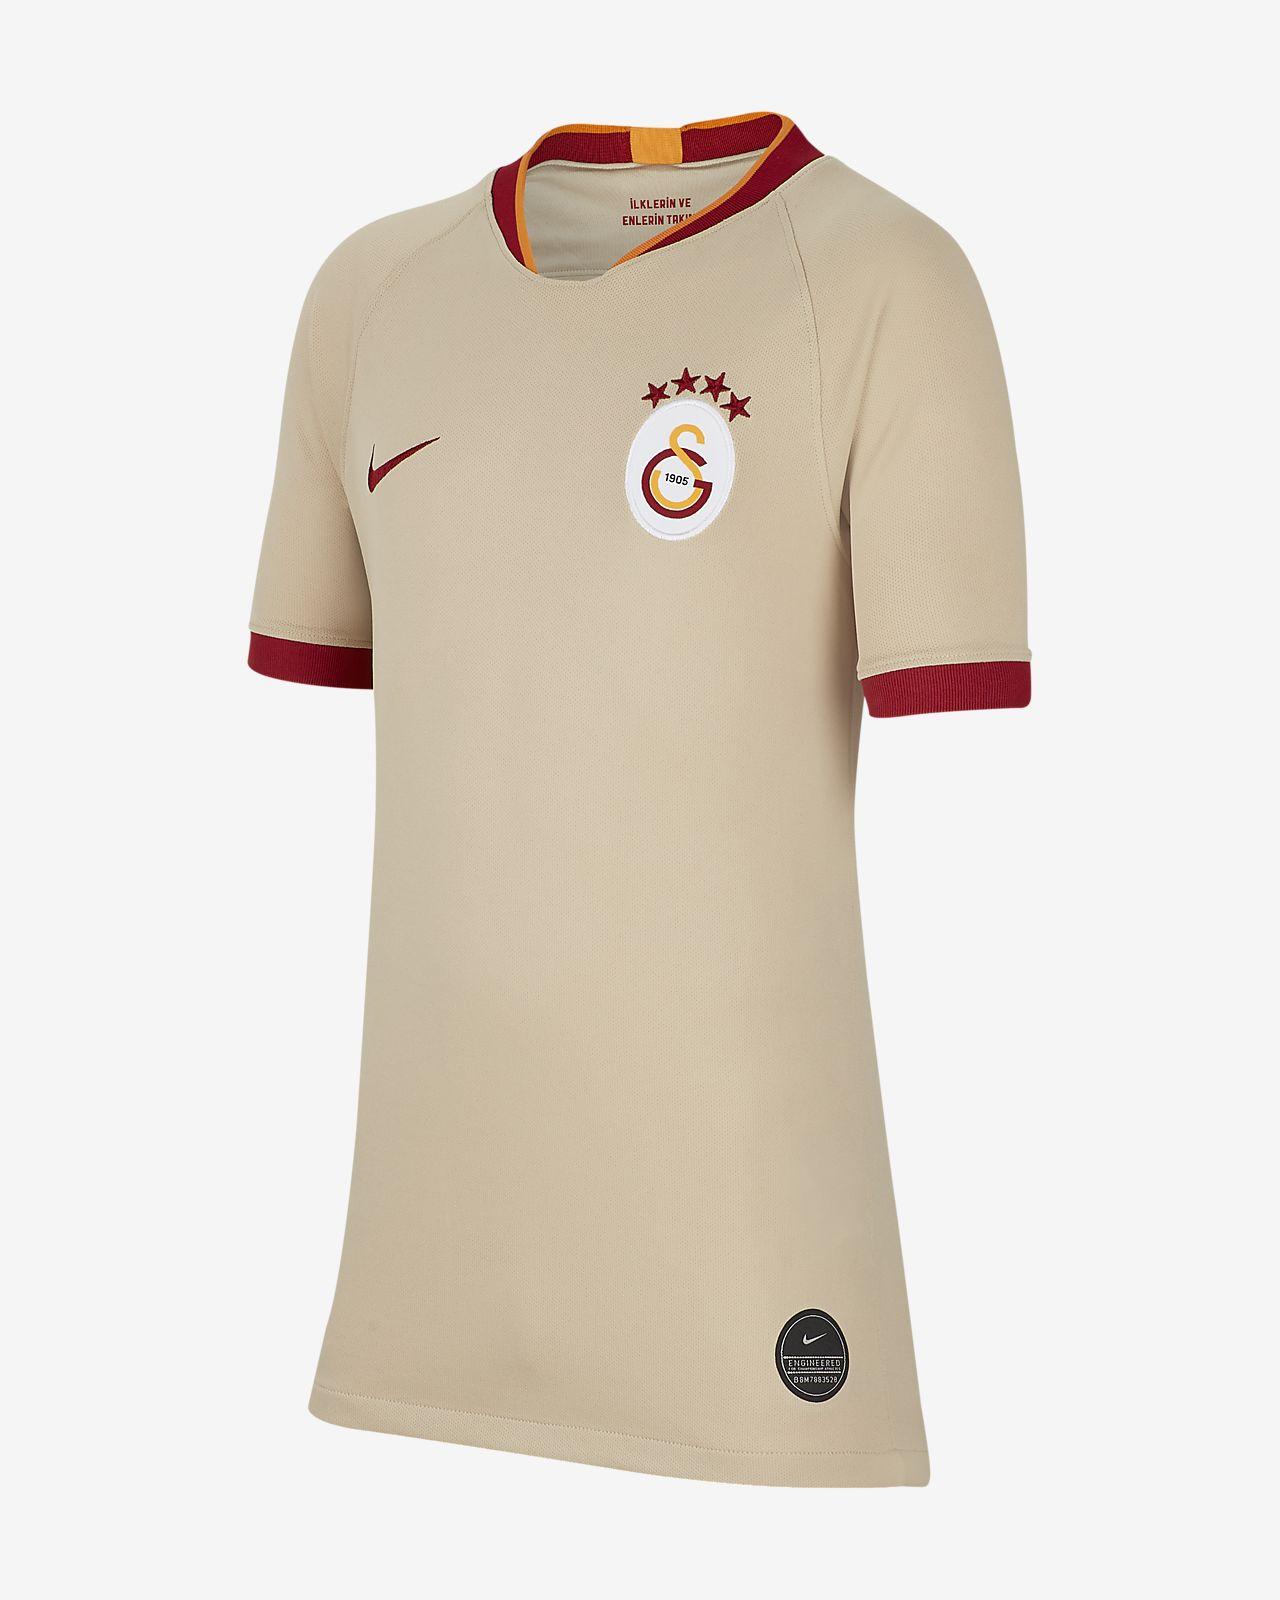 Maillot de football Galatasaray 2020 Stadium Away pour Enfant plus âgé